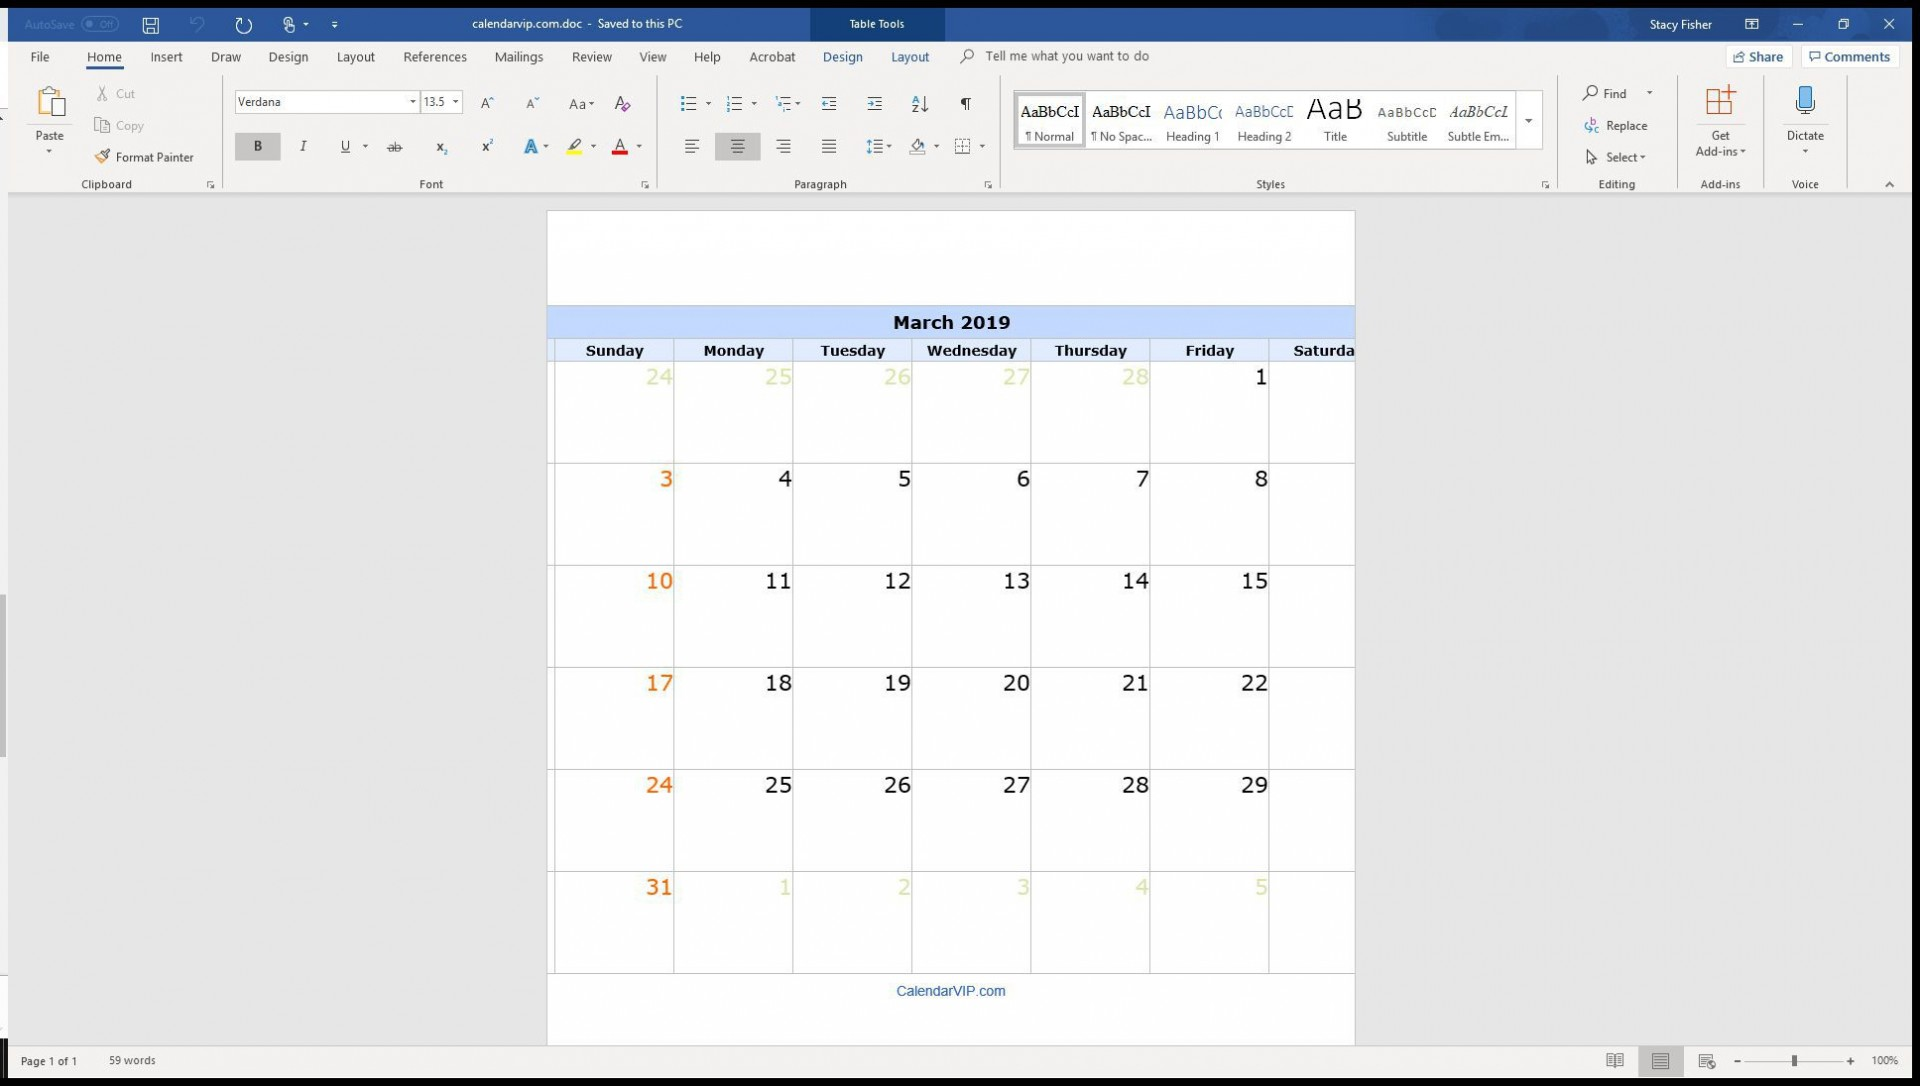 004 Surprising Calendar Template For Word 2007 Design 1920